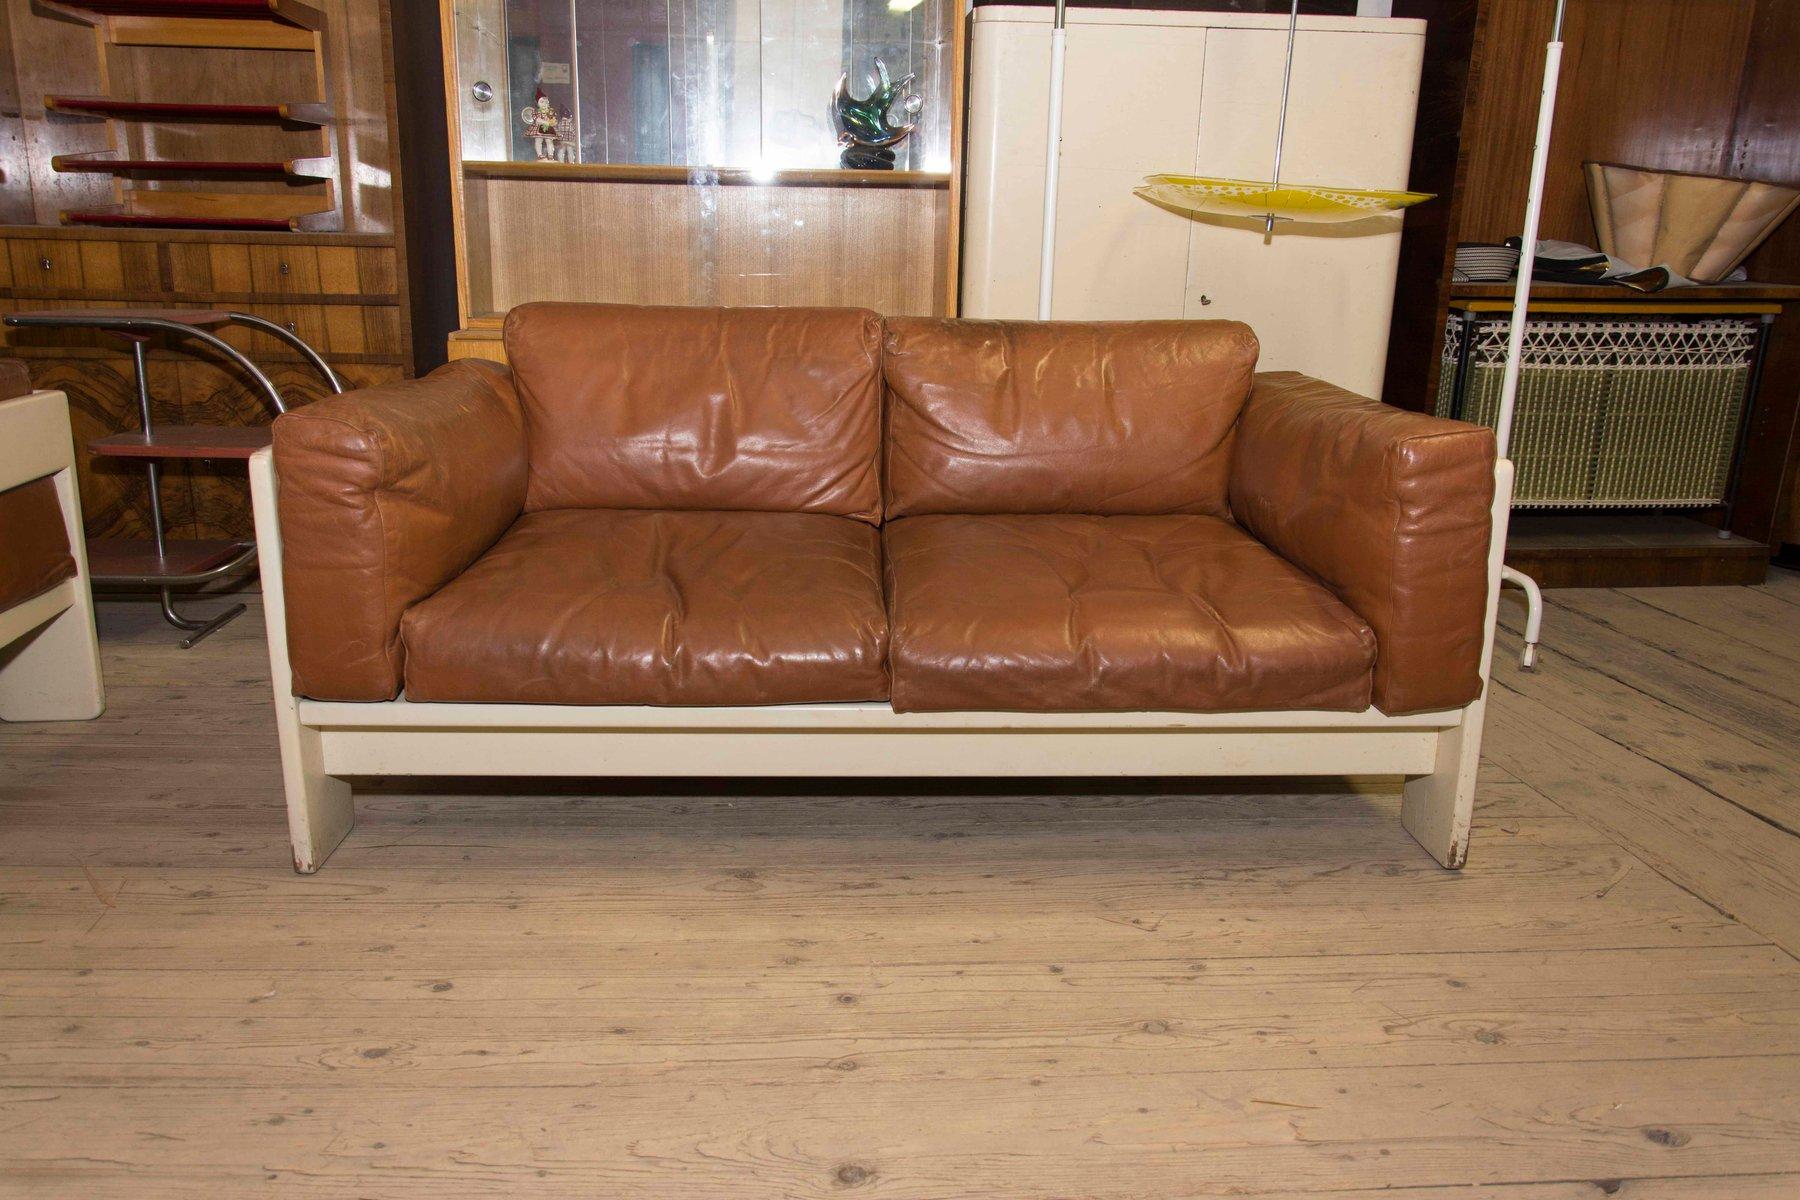 2 sitzer bastiano ledersofa von afra tobia scarpa 1970er bei pamono kaufen. Black Bedroom Furniture Sets. Home Design Ideas